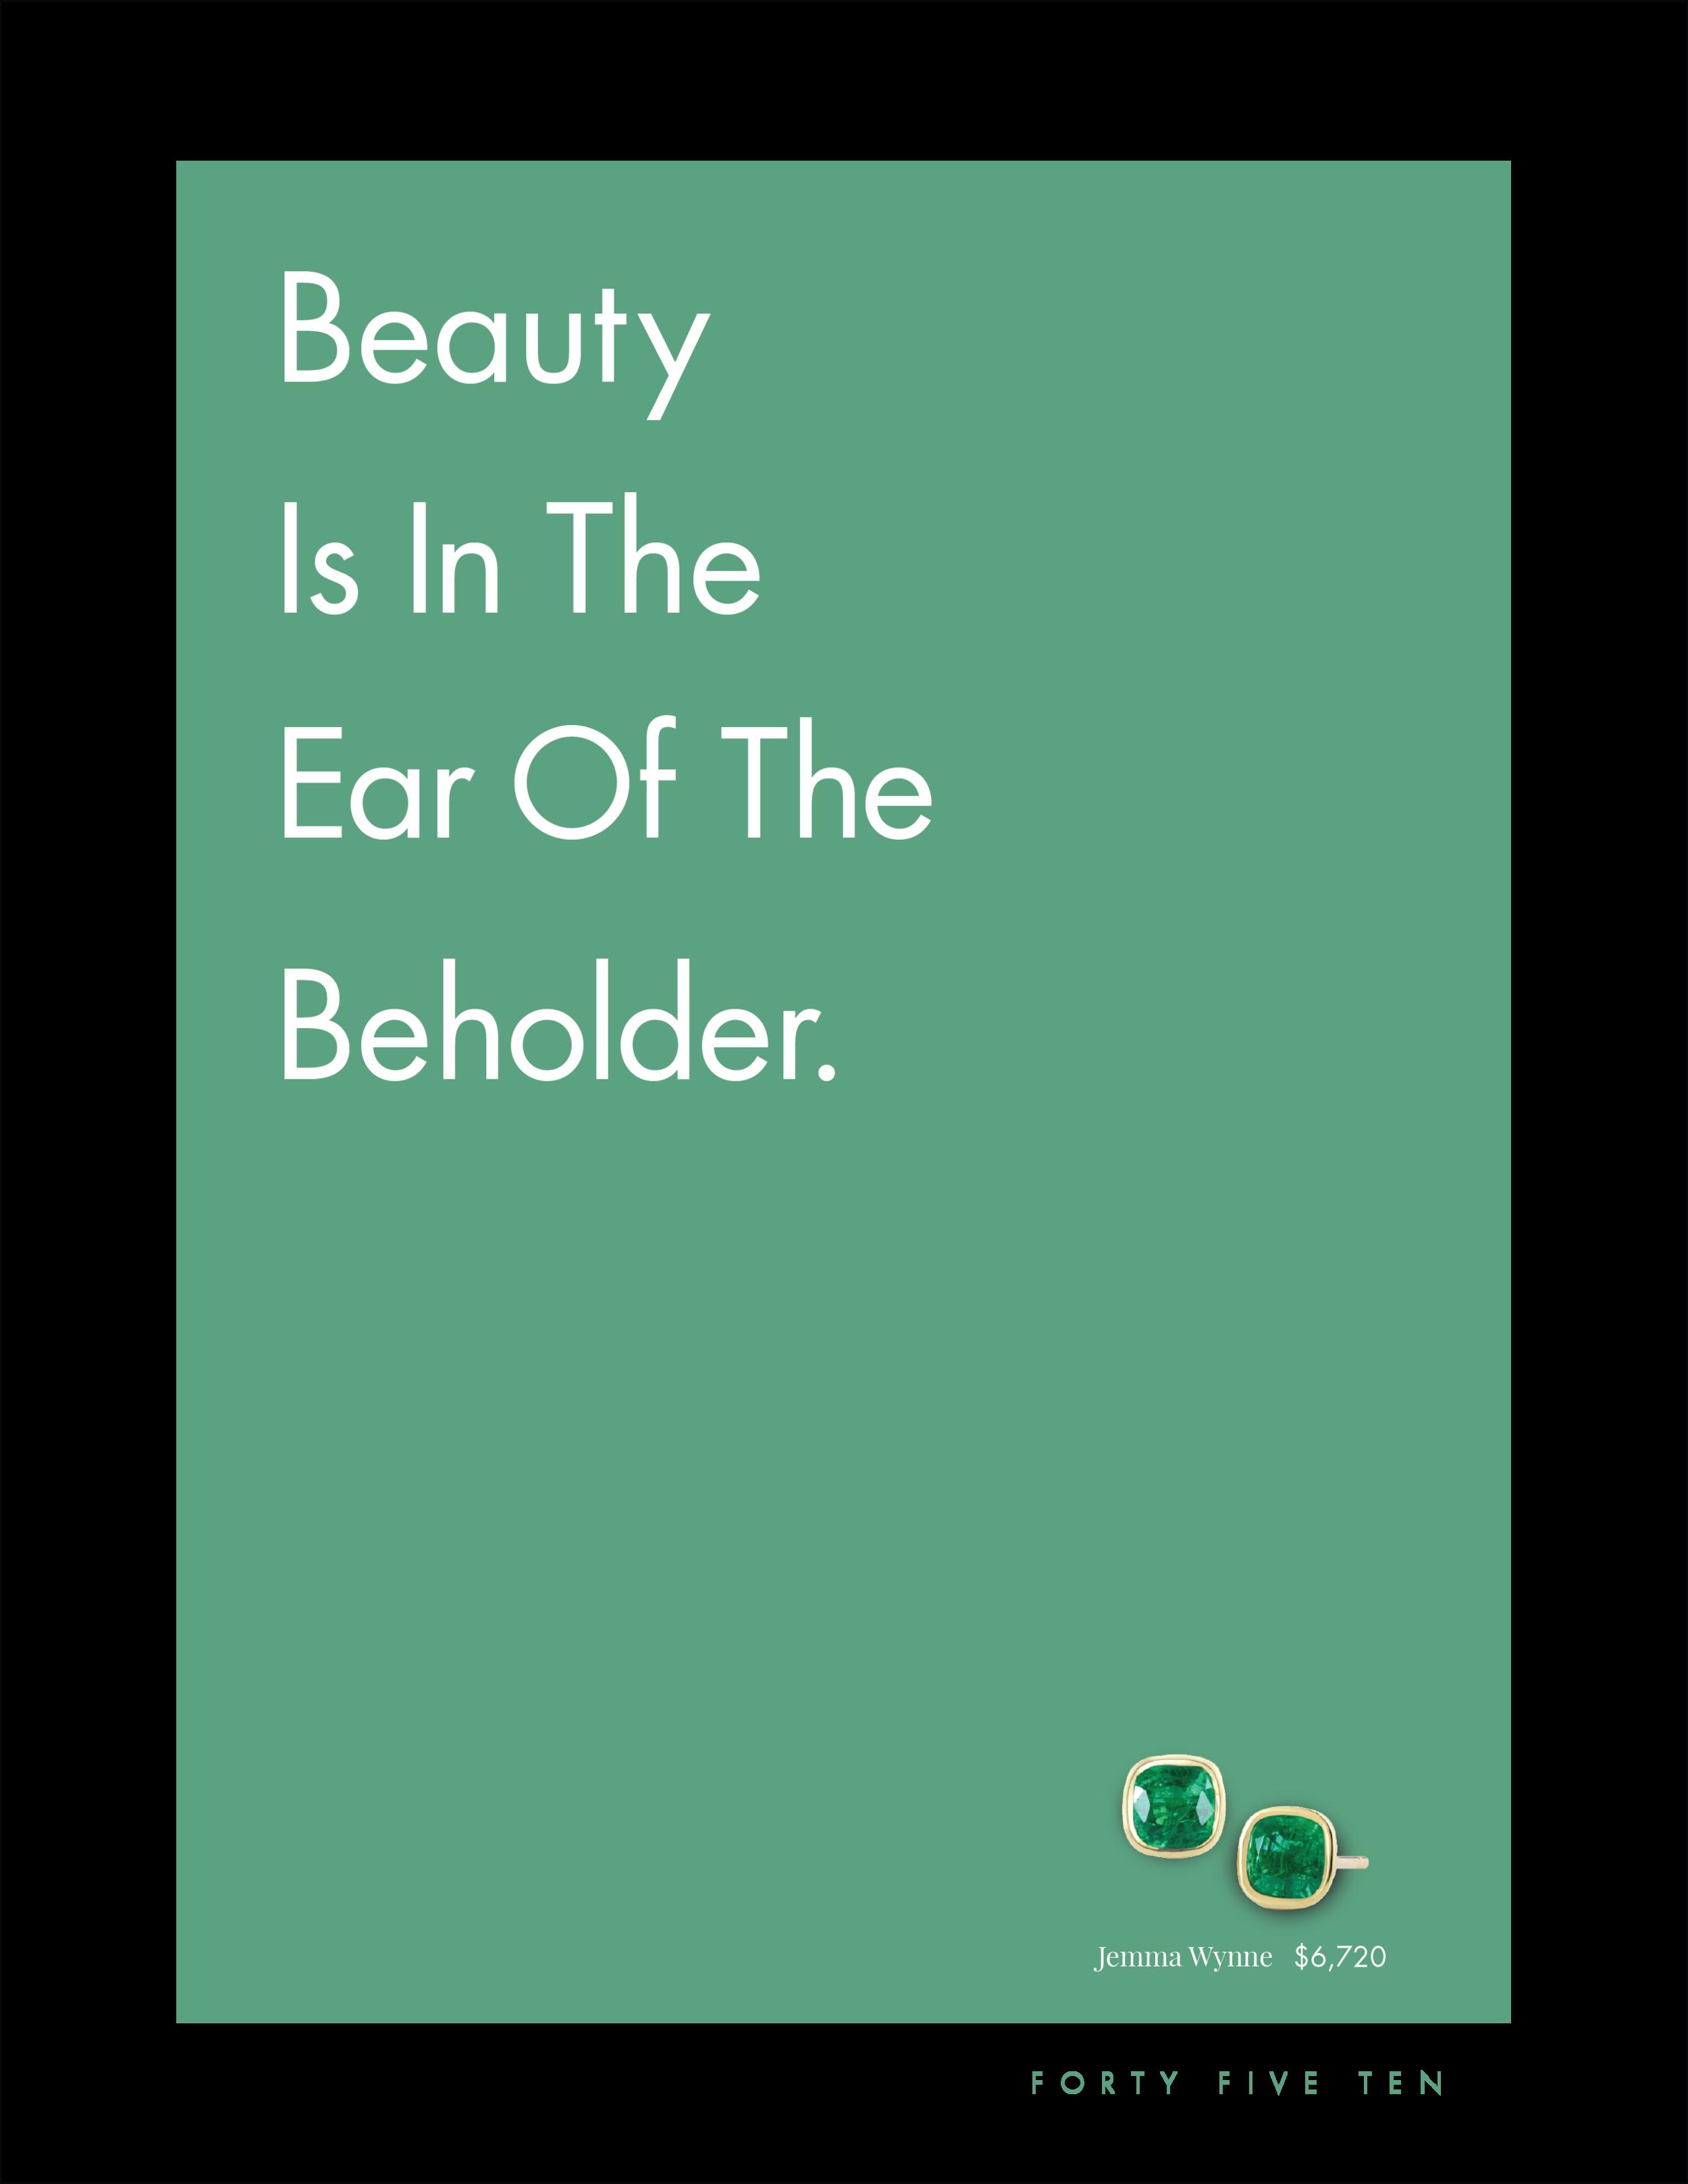 4510-print-ad-beauty.png